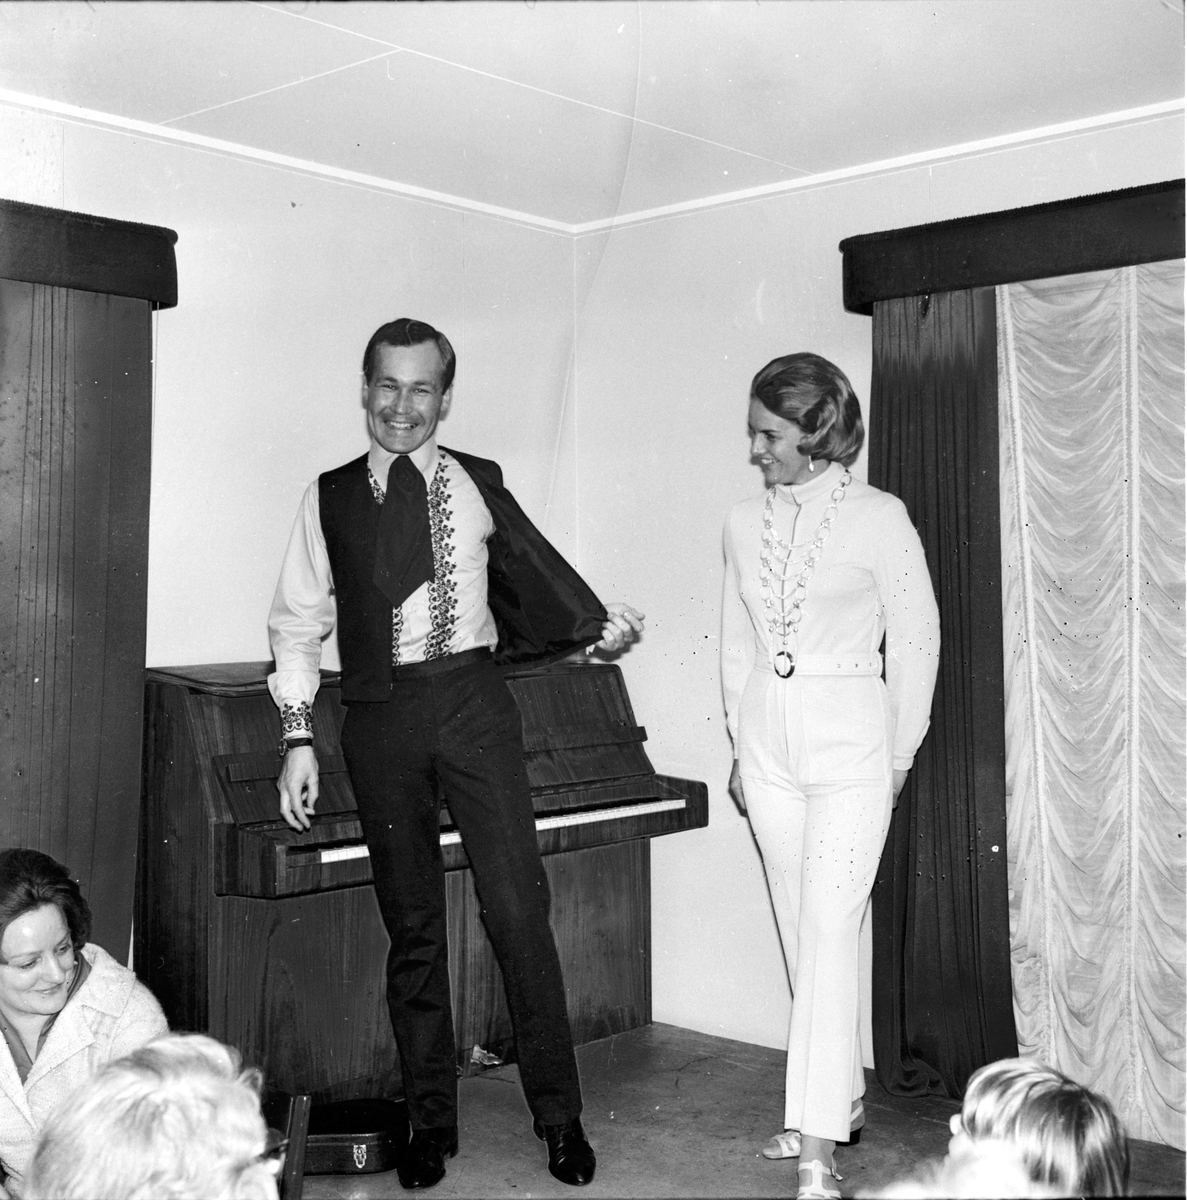 Arbrå, Mannekänguppvisning, April 1969